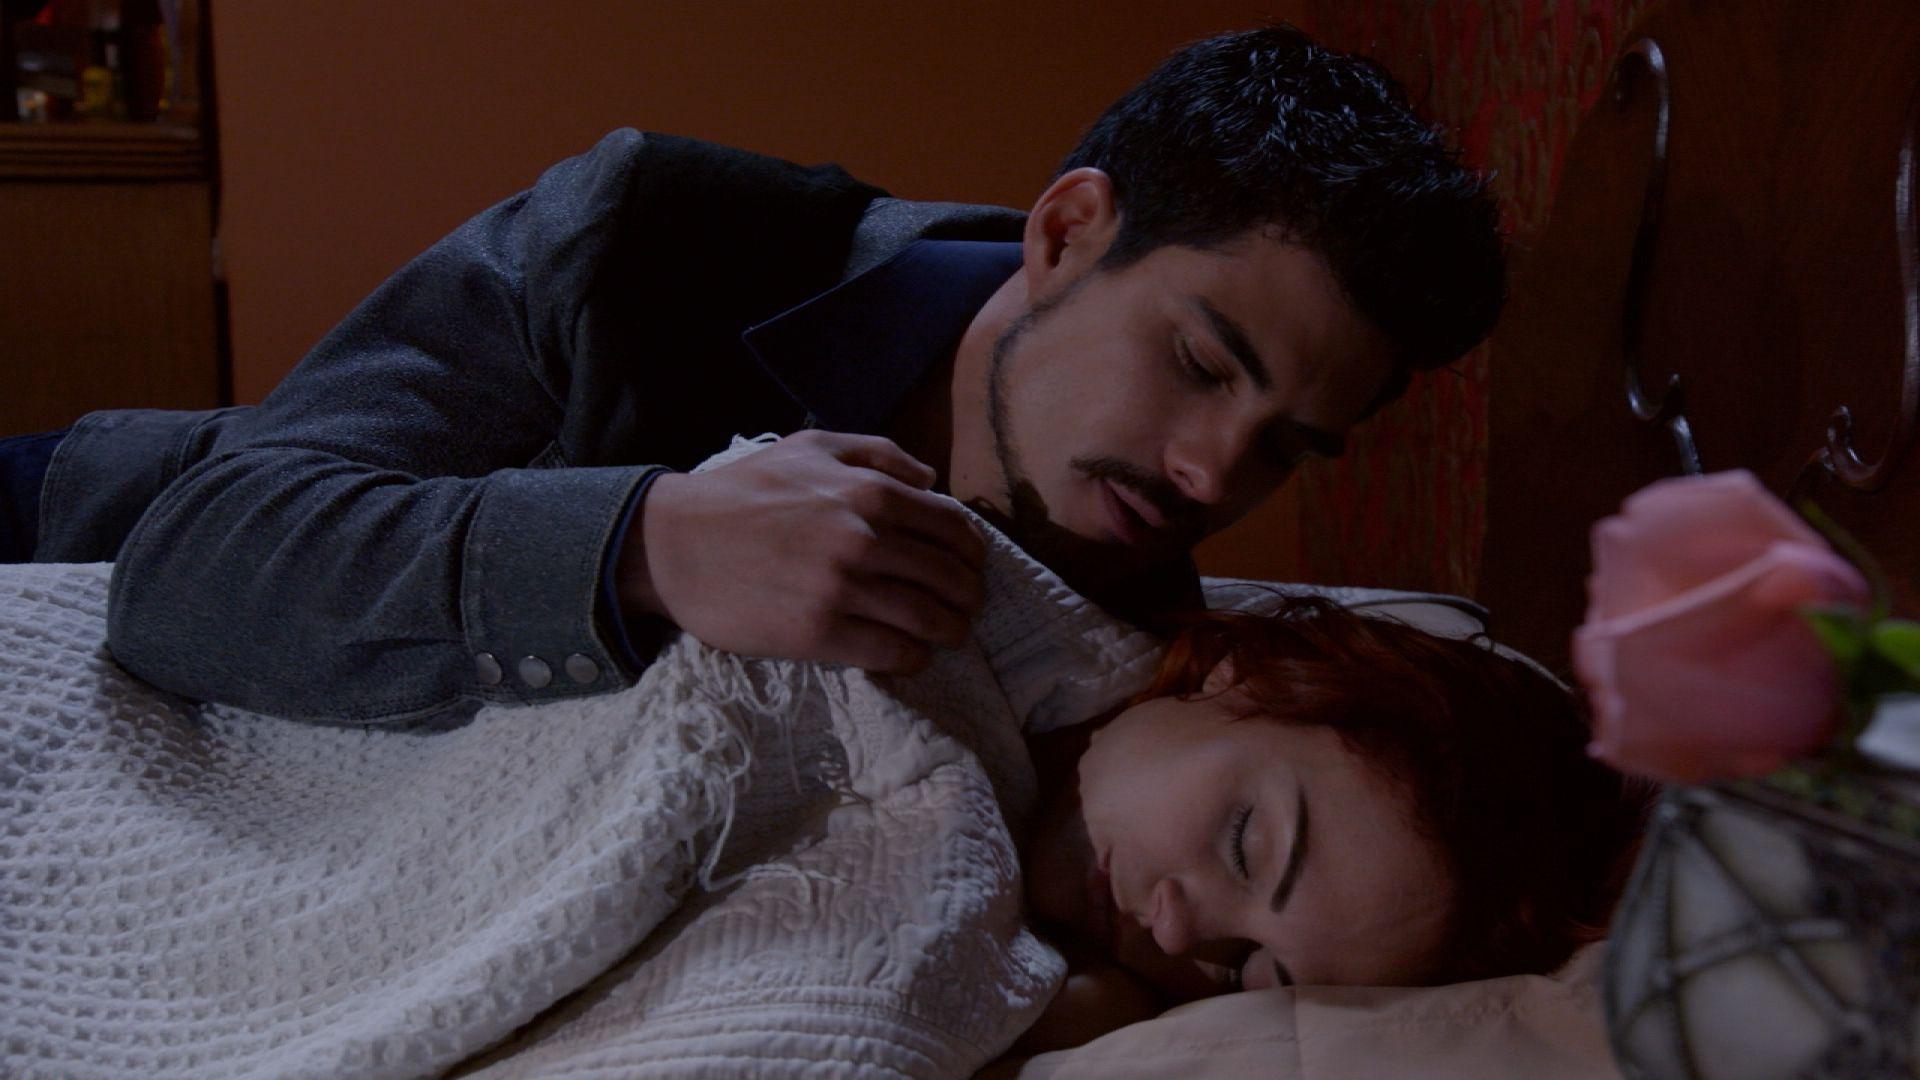 Capítulo 9 de abril – Un visitante nocturno para Mónica | Mi Adorable Maldición